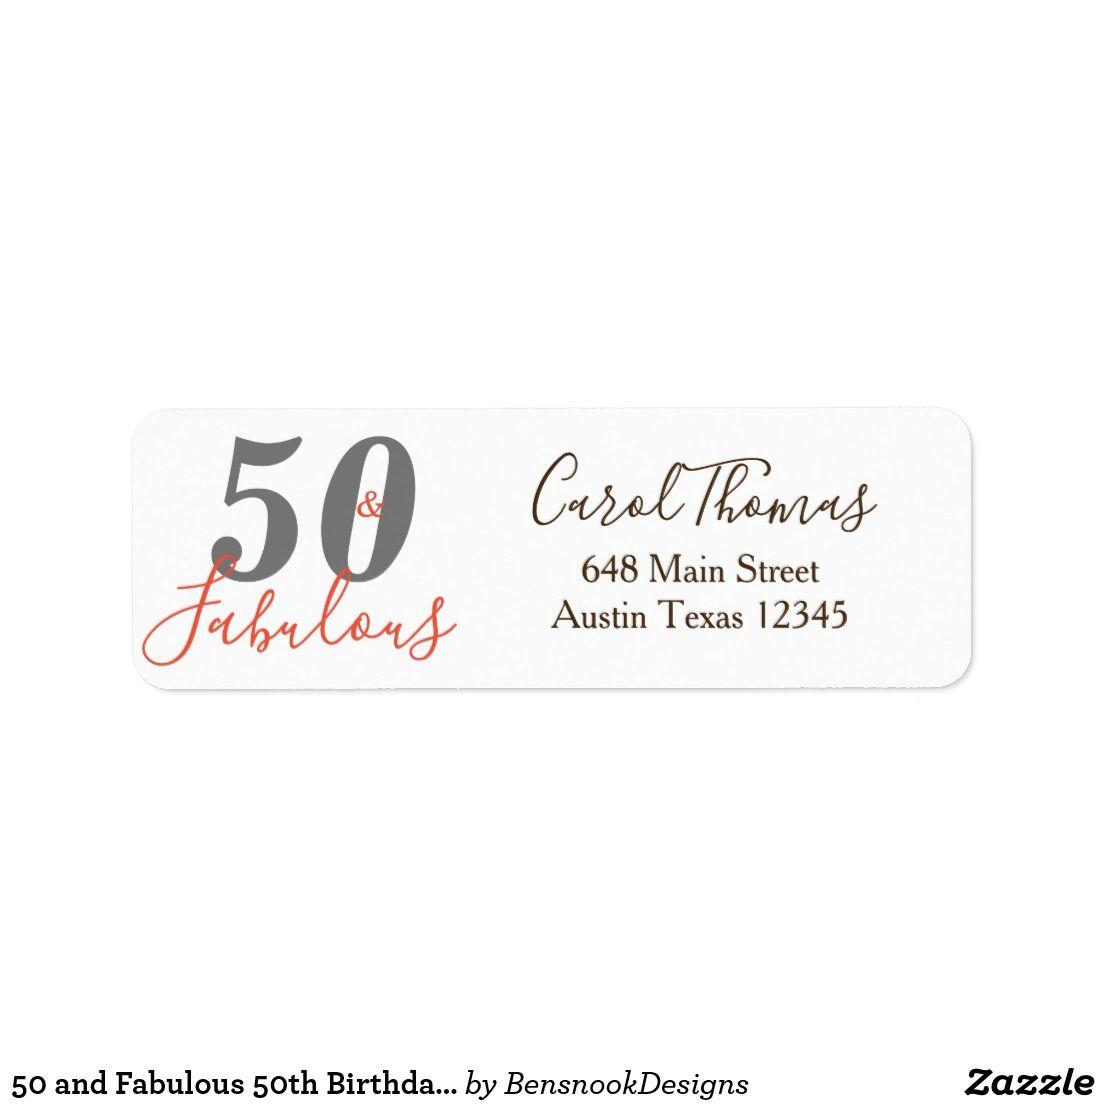 Ab Fab 50: 50 And Fabulous 50th Birthday Return Address Label